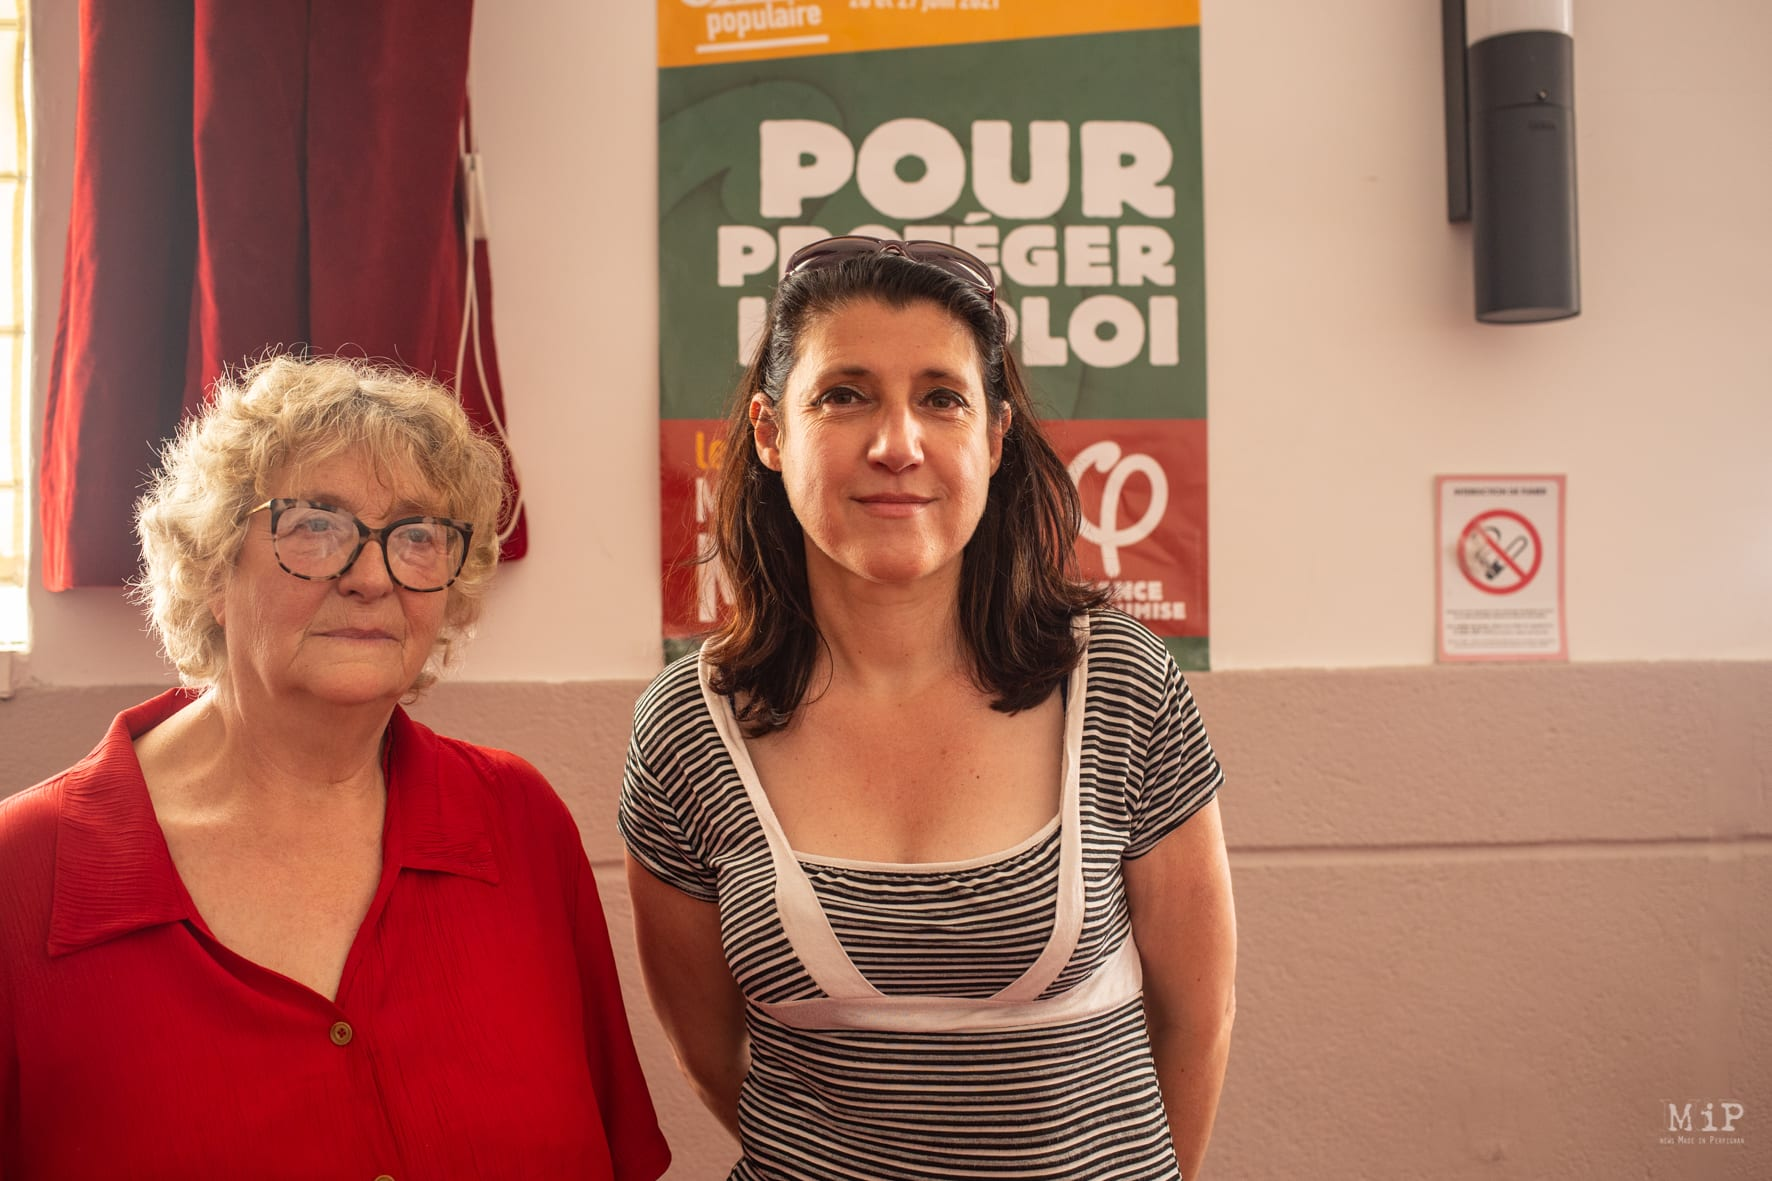 FRANCE - POLITICS - OCCITANIE REGIONAL ELECTION - MYRIAM MARTIN